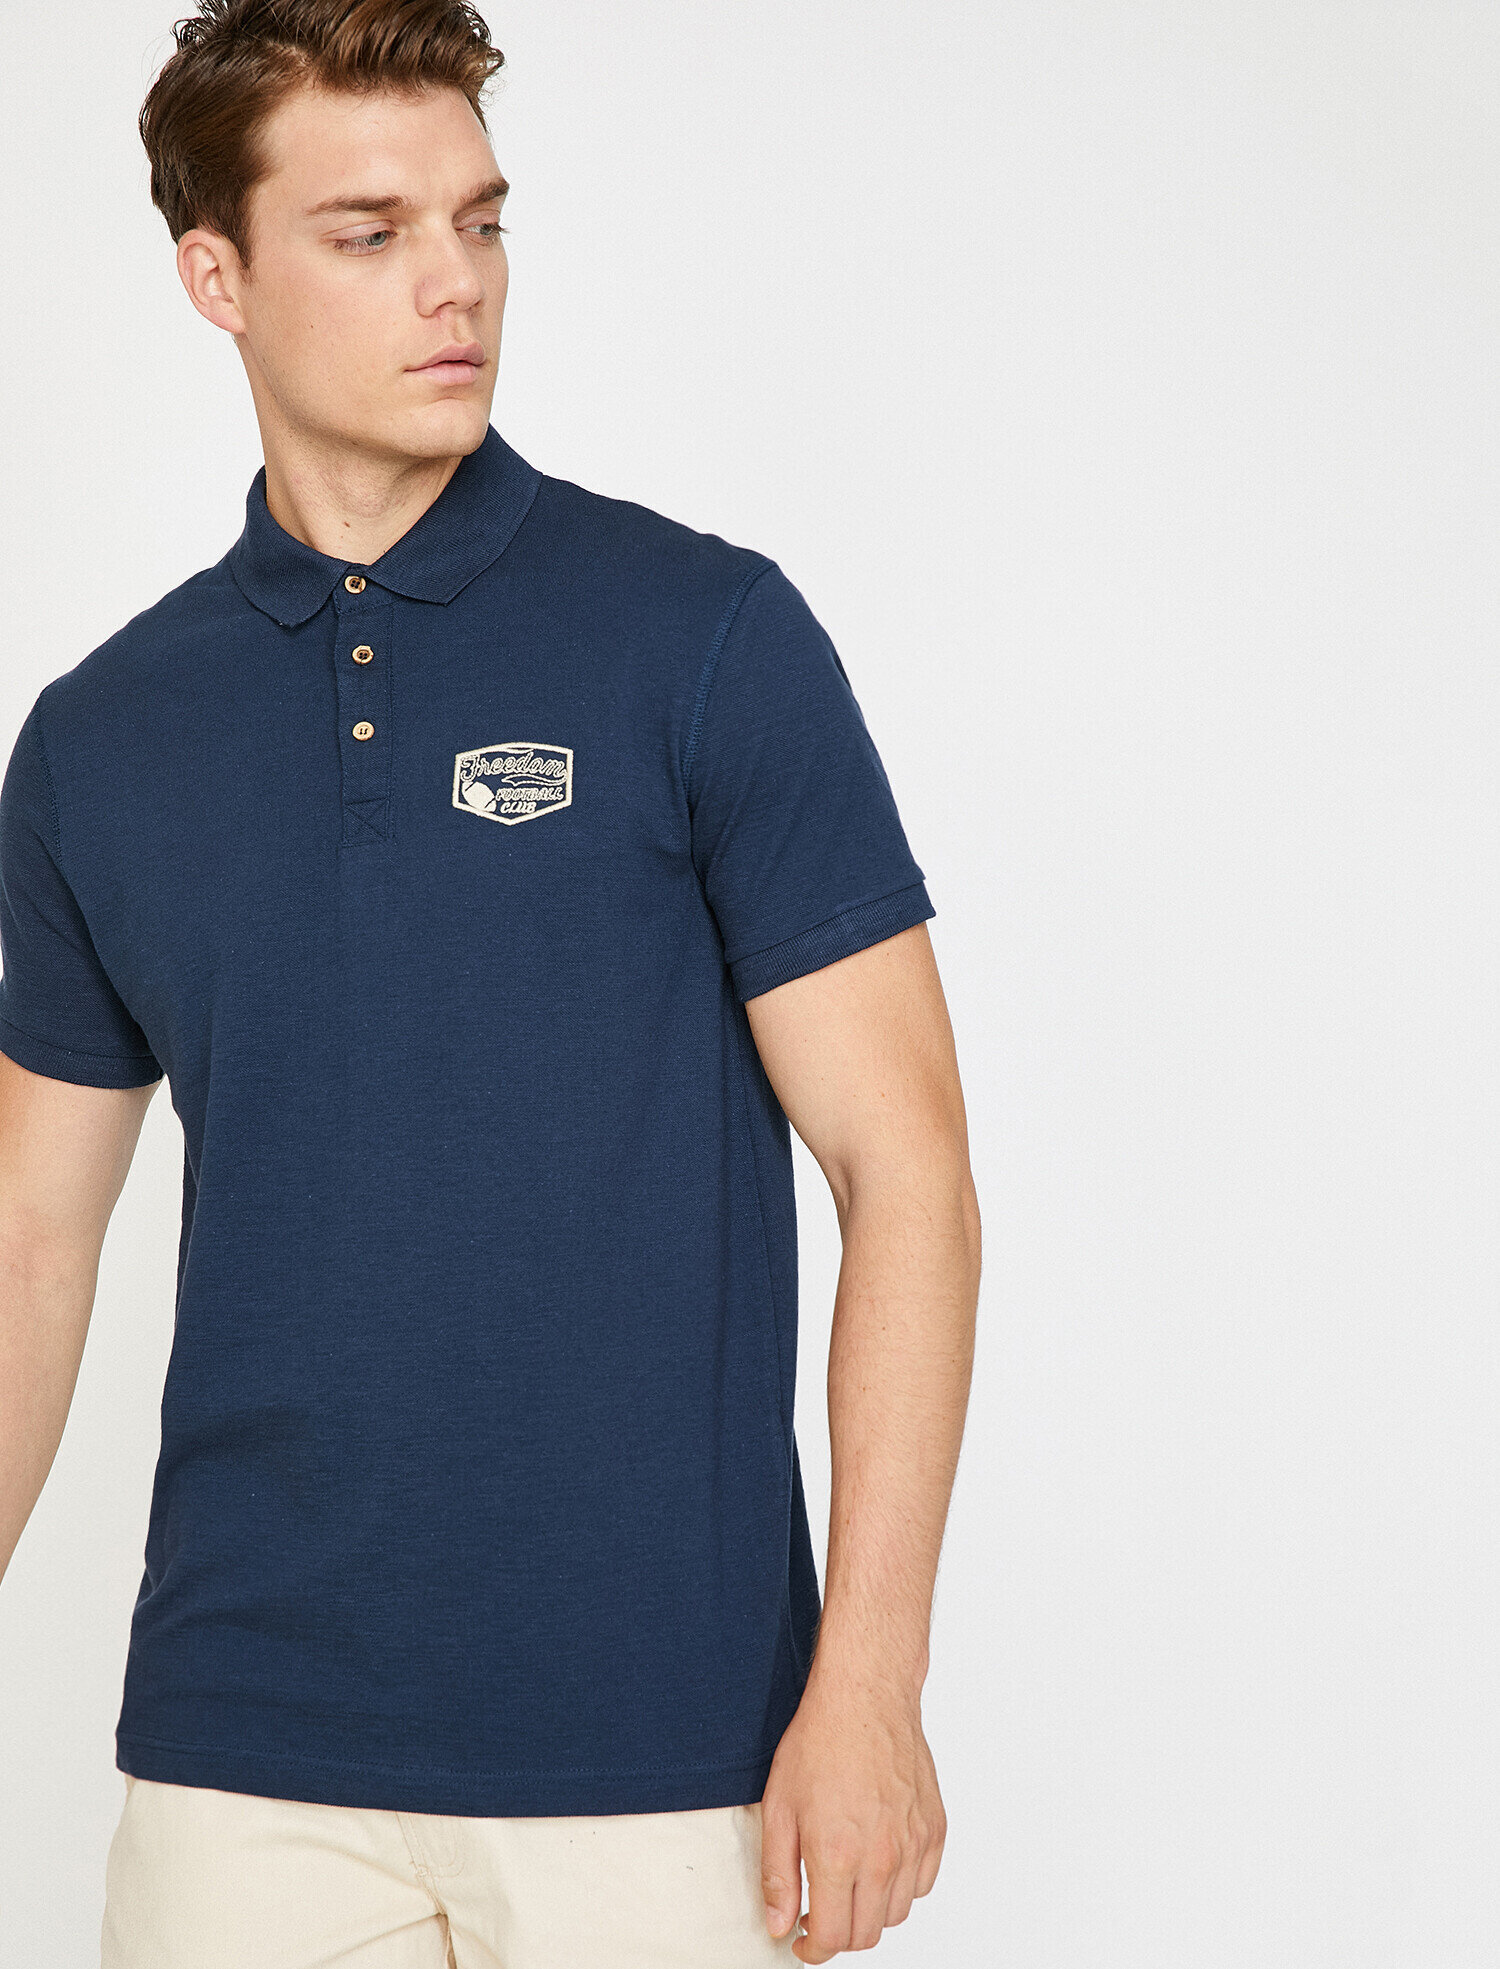 1782ddf5d545 Navy Men Polo Neck T-Shirt 8YAM14506OKNA1